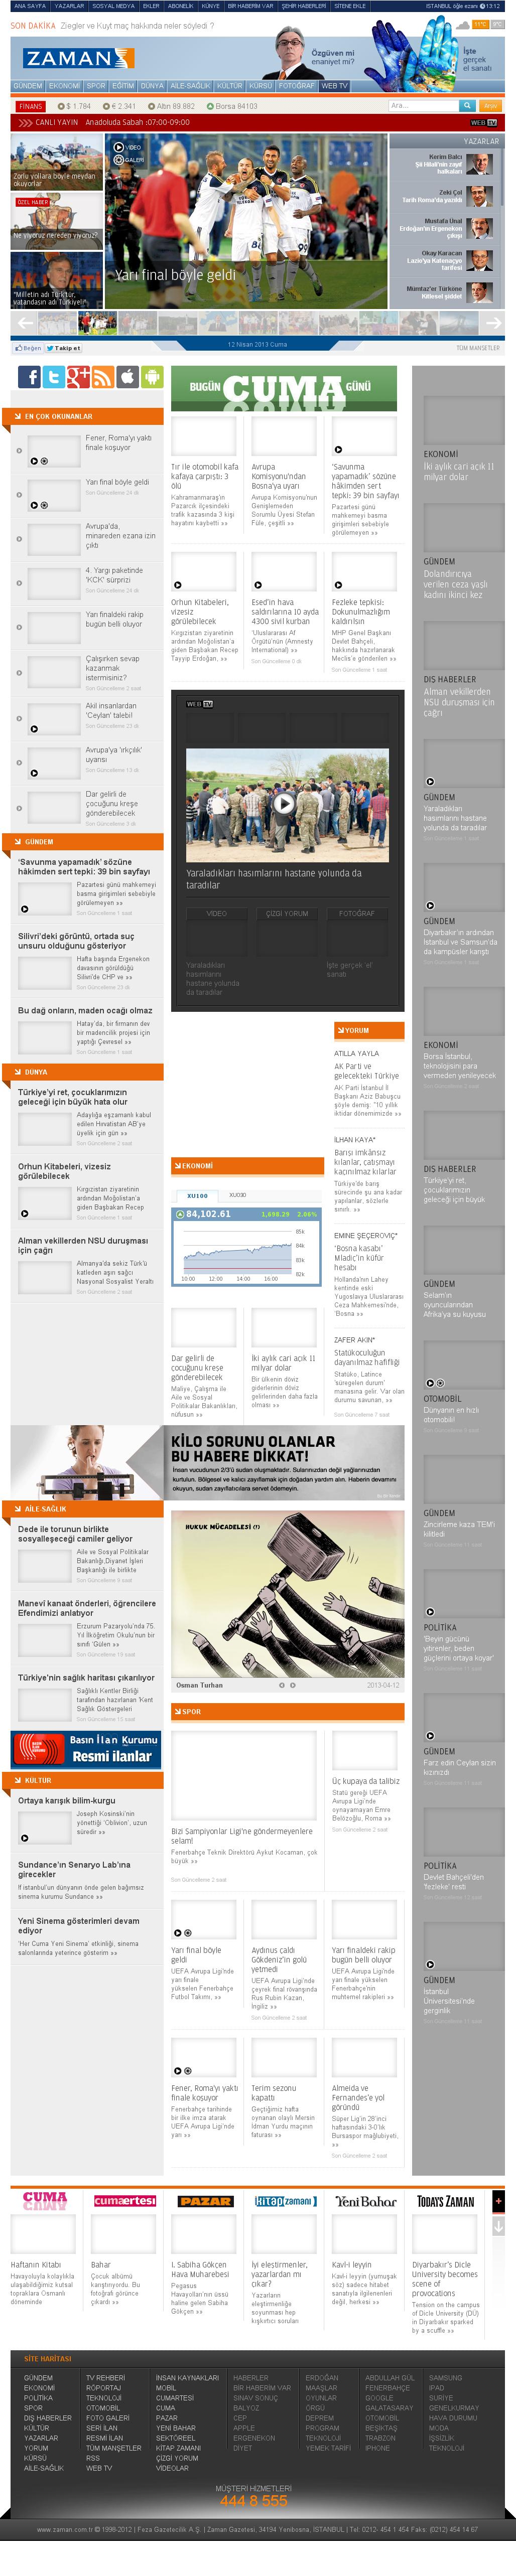 Zaman Online at Friday April 12, 2013, 4:31 a.m. UTC